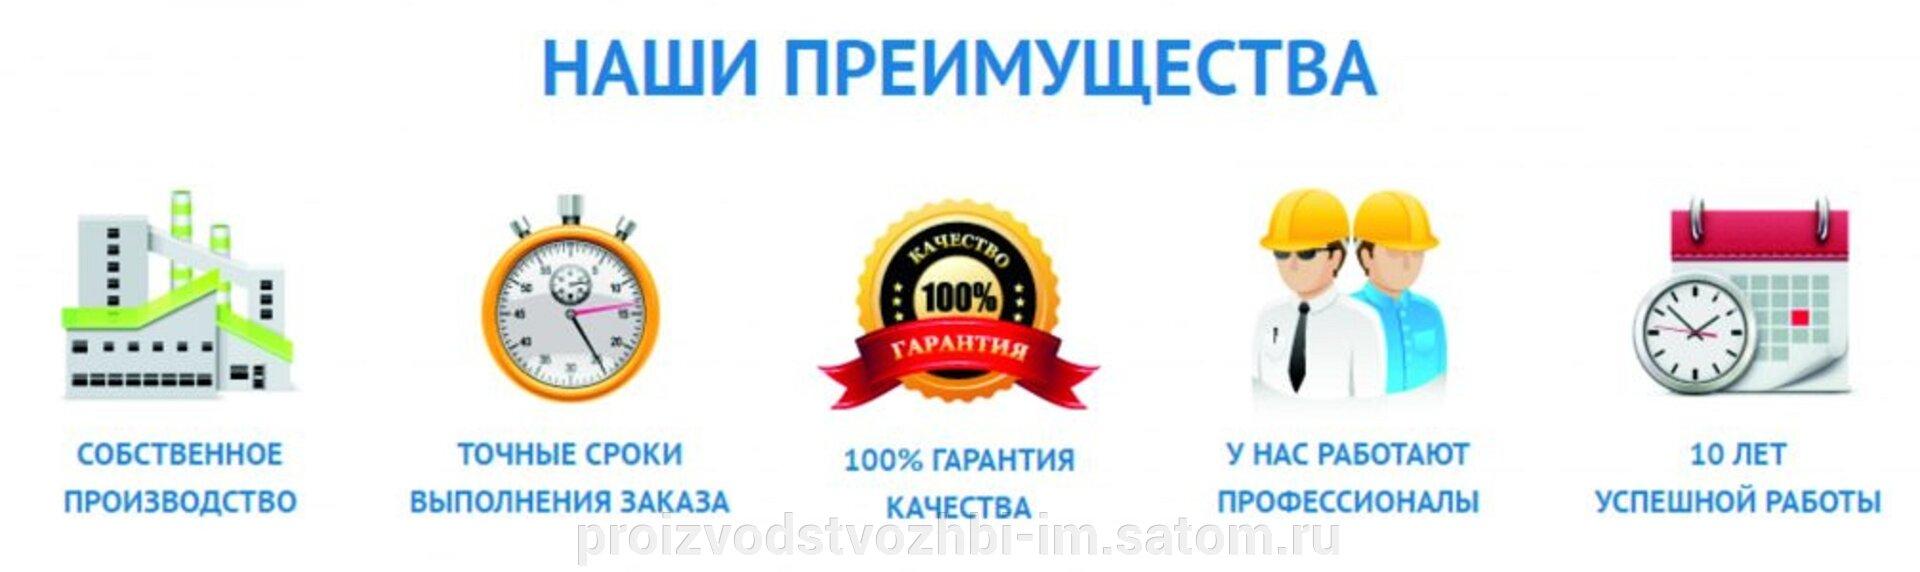 Лоток кабельный ЛК300.120.120-3 - фото pic_ca3ccaecdcfa139a1d379873625f01bd_1920x9000_1.jpg